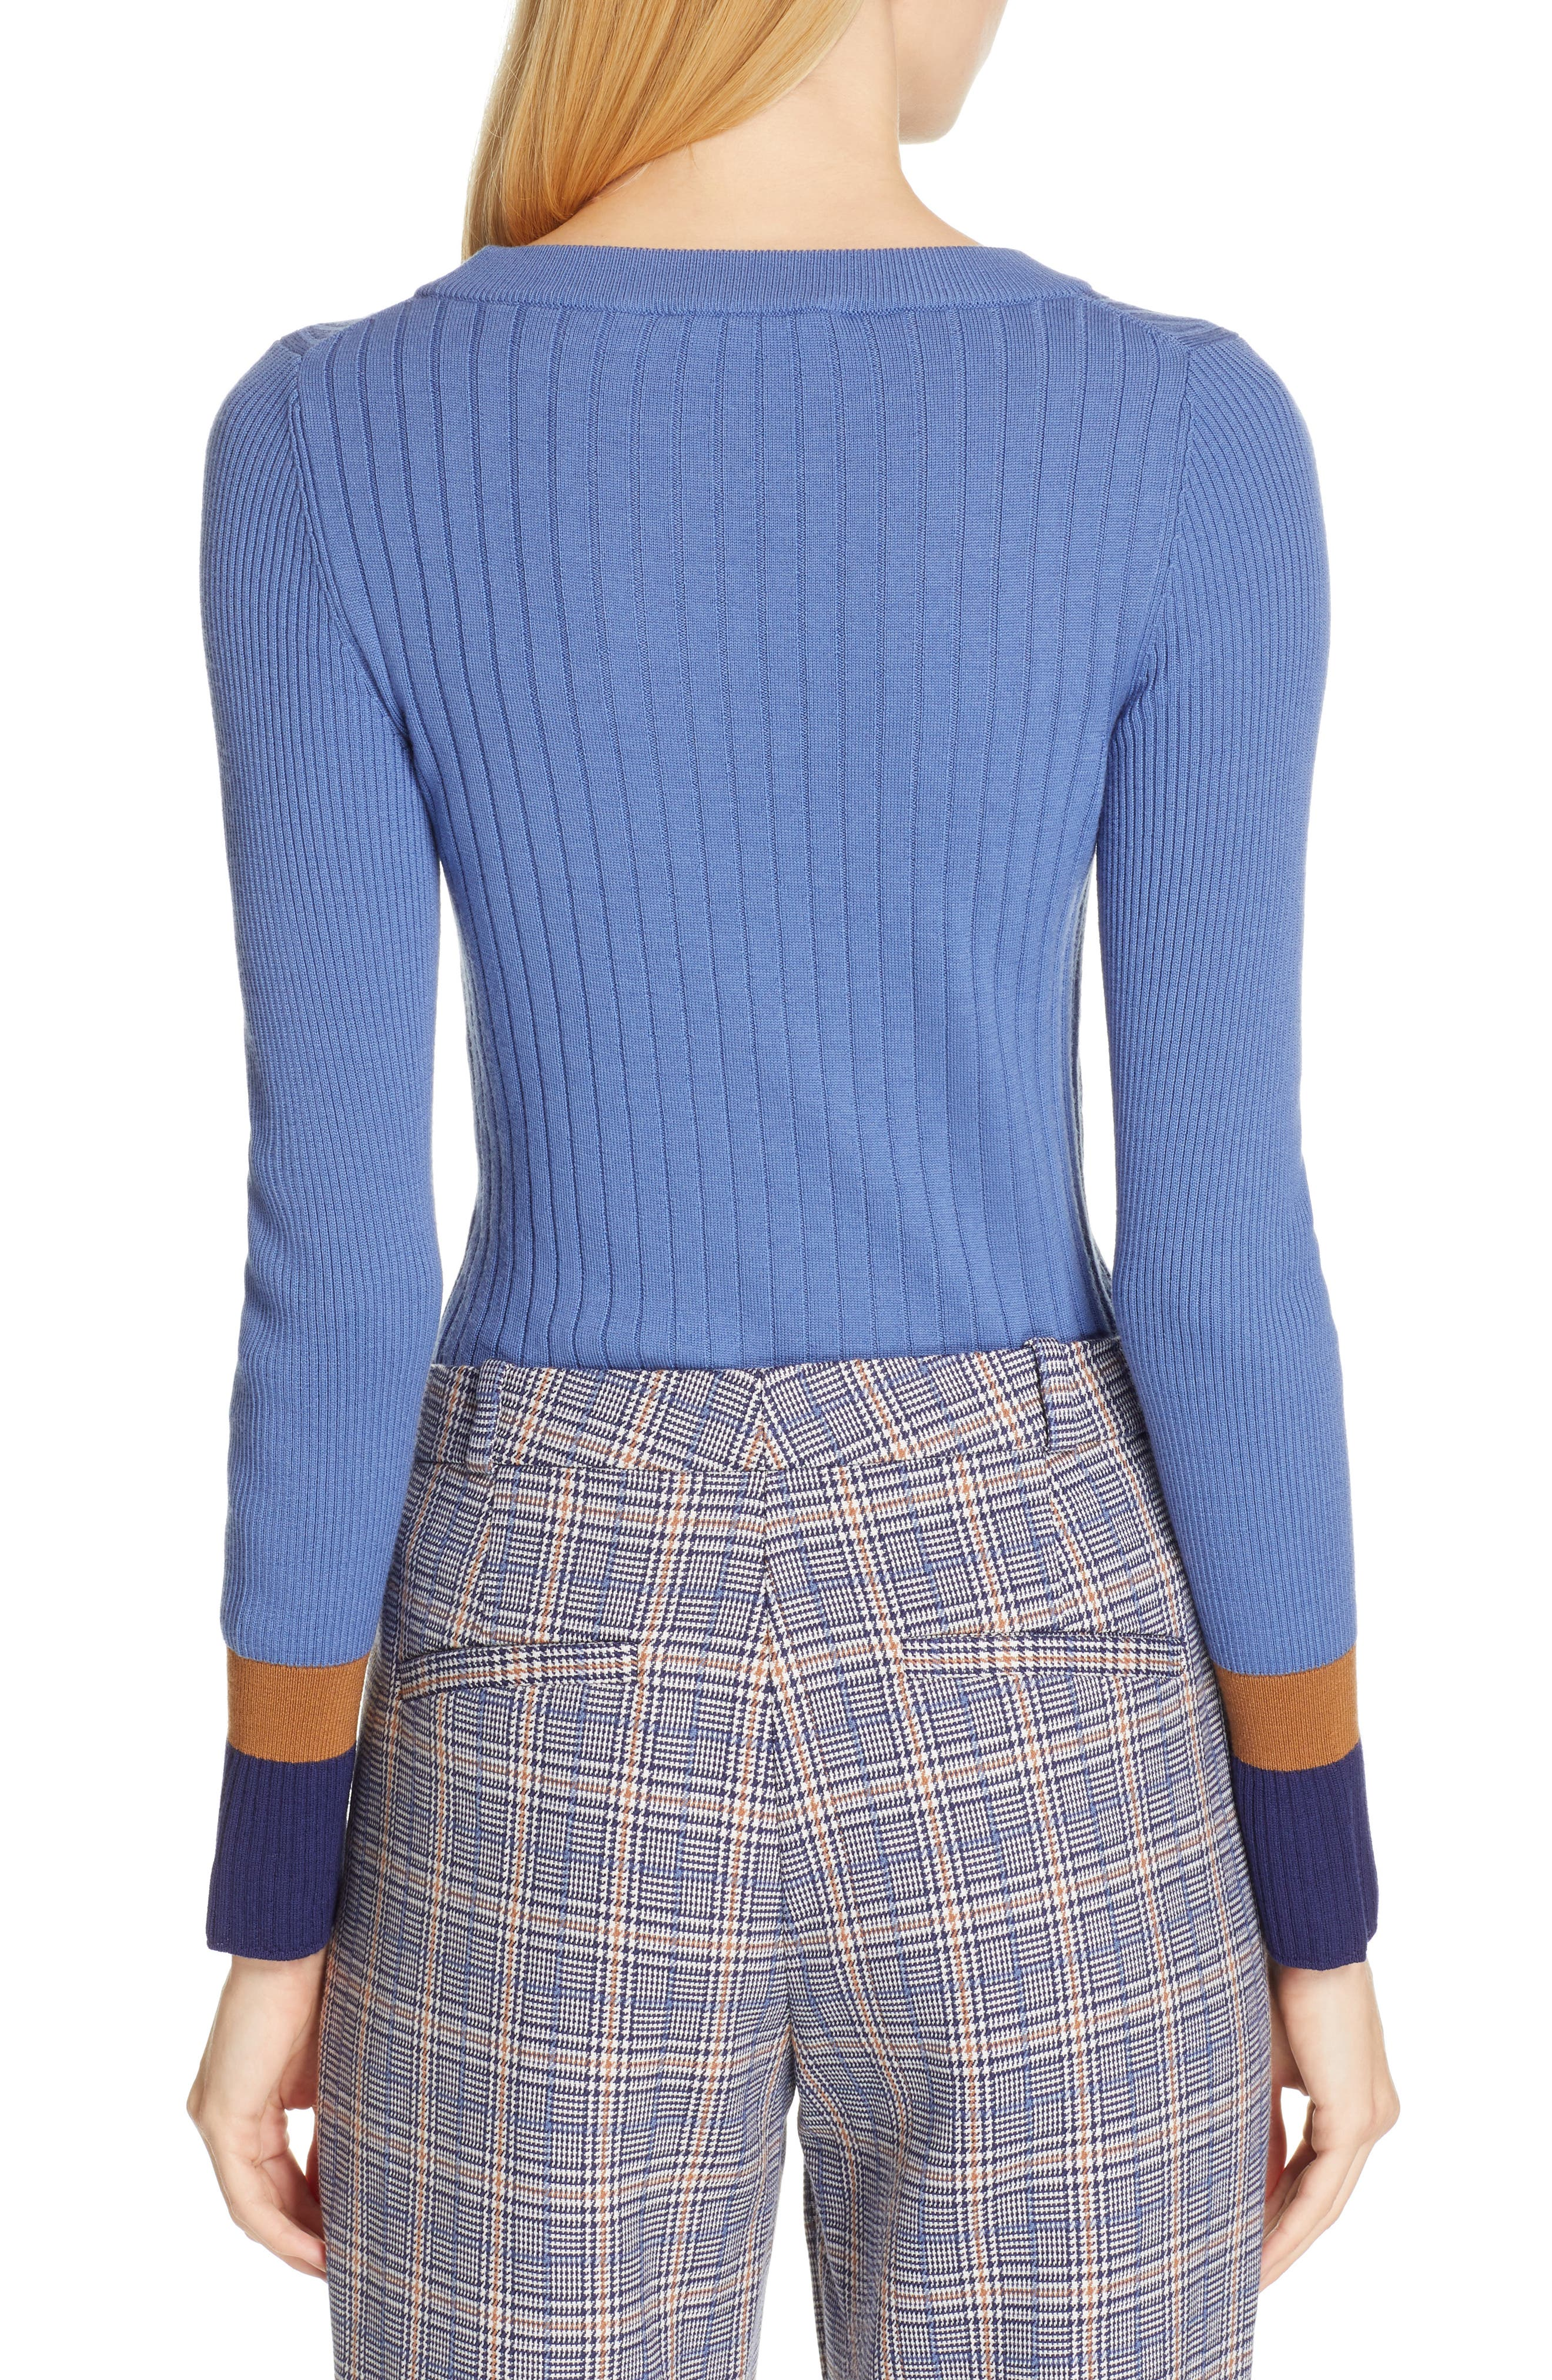 Fadeline Blue Fantasy Ribbed Wool Sweater,                             Alternate thumbnail 2, color,                             SOFT BLUE FANTASY